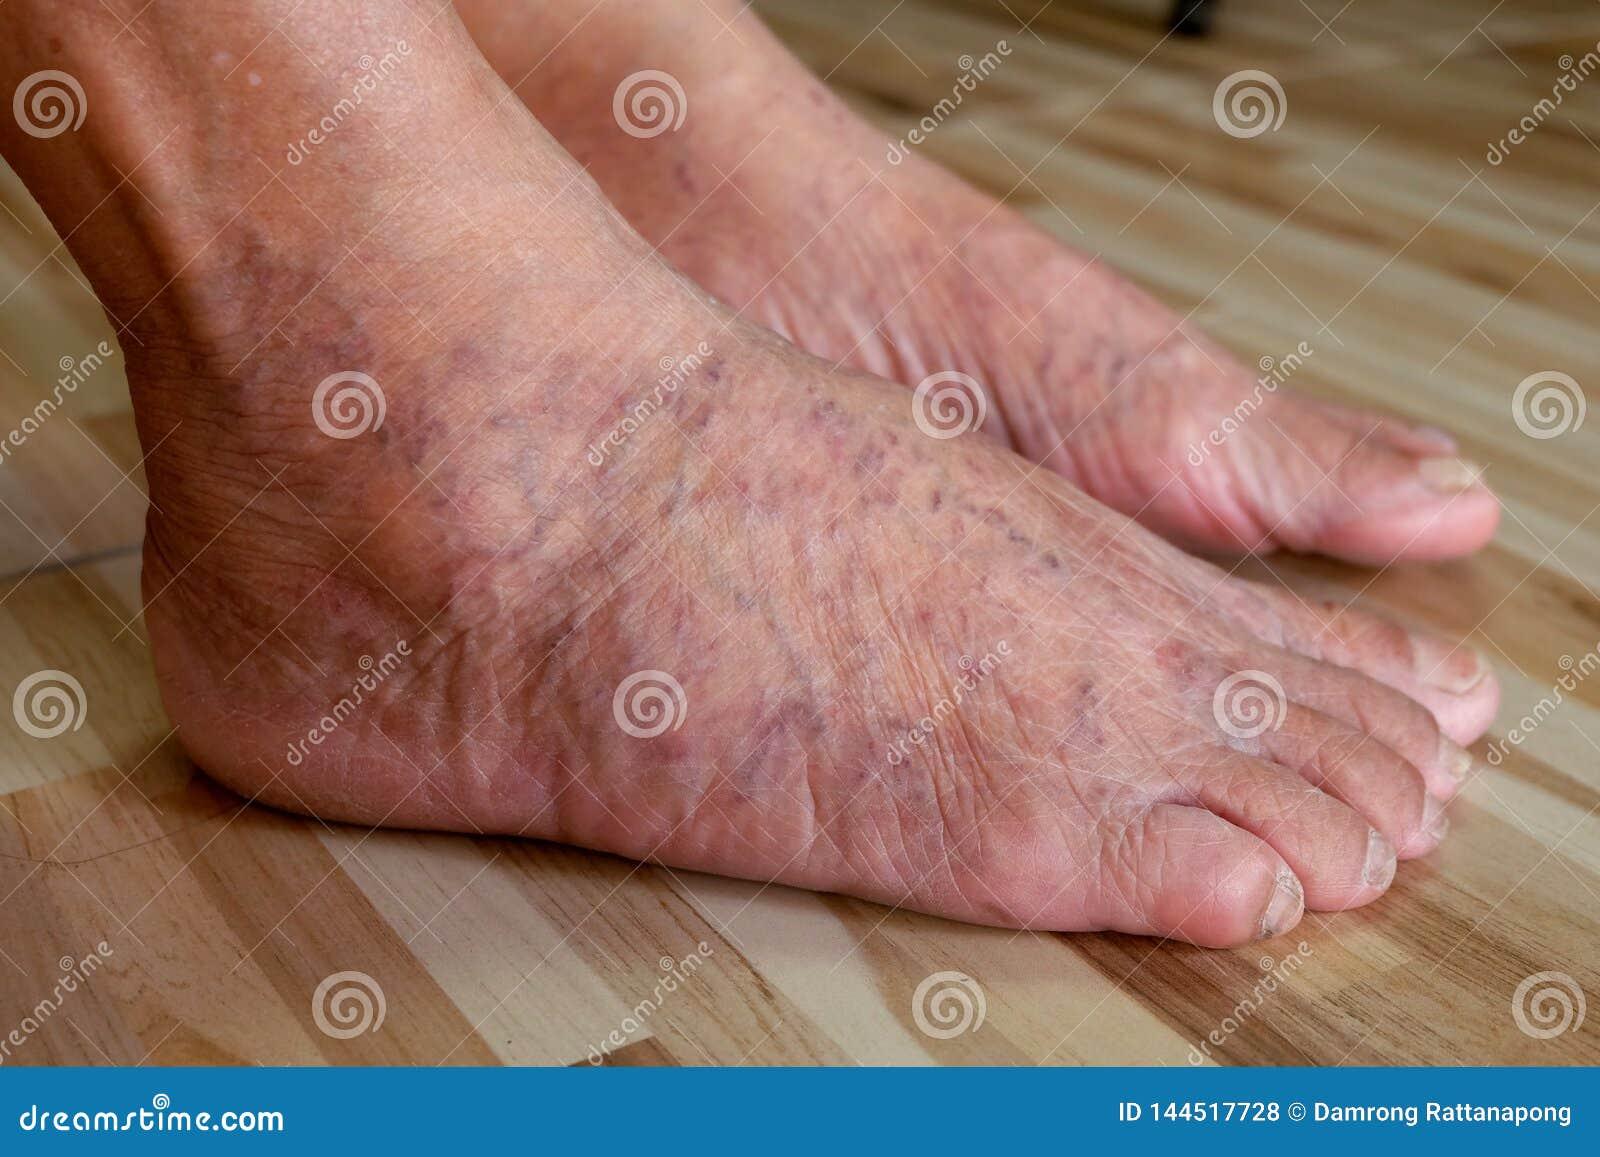 varicose foot woman fotografii)